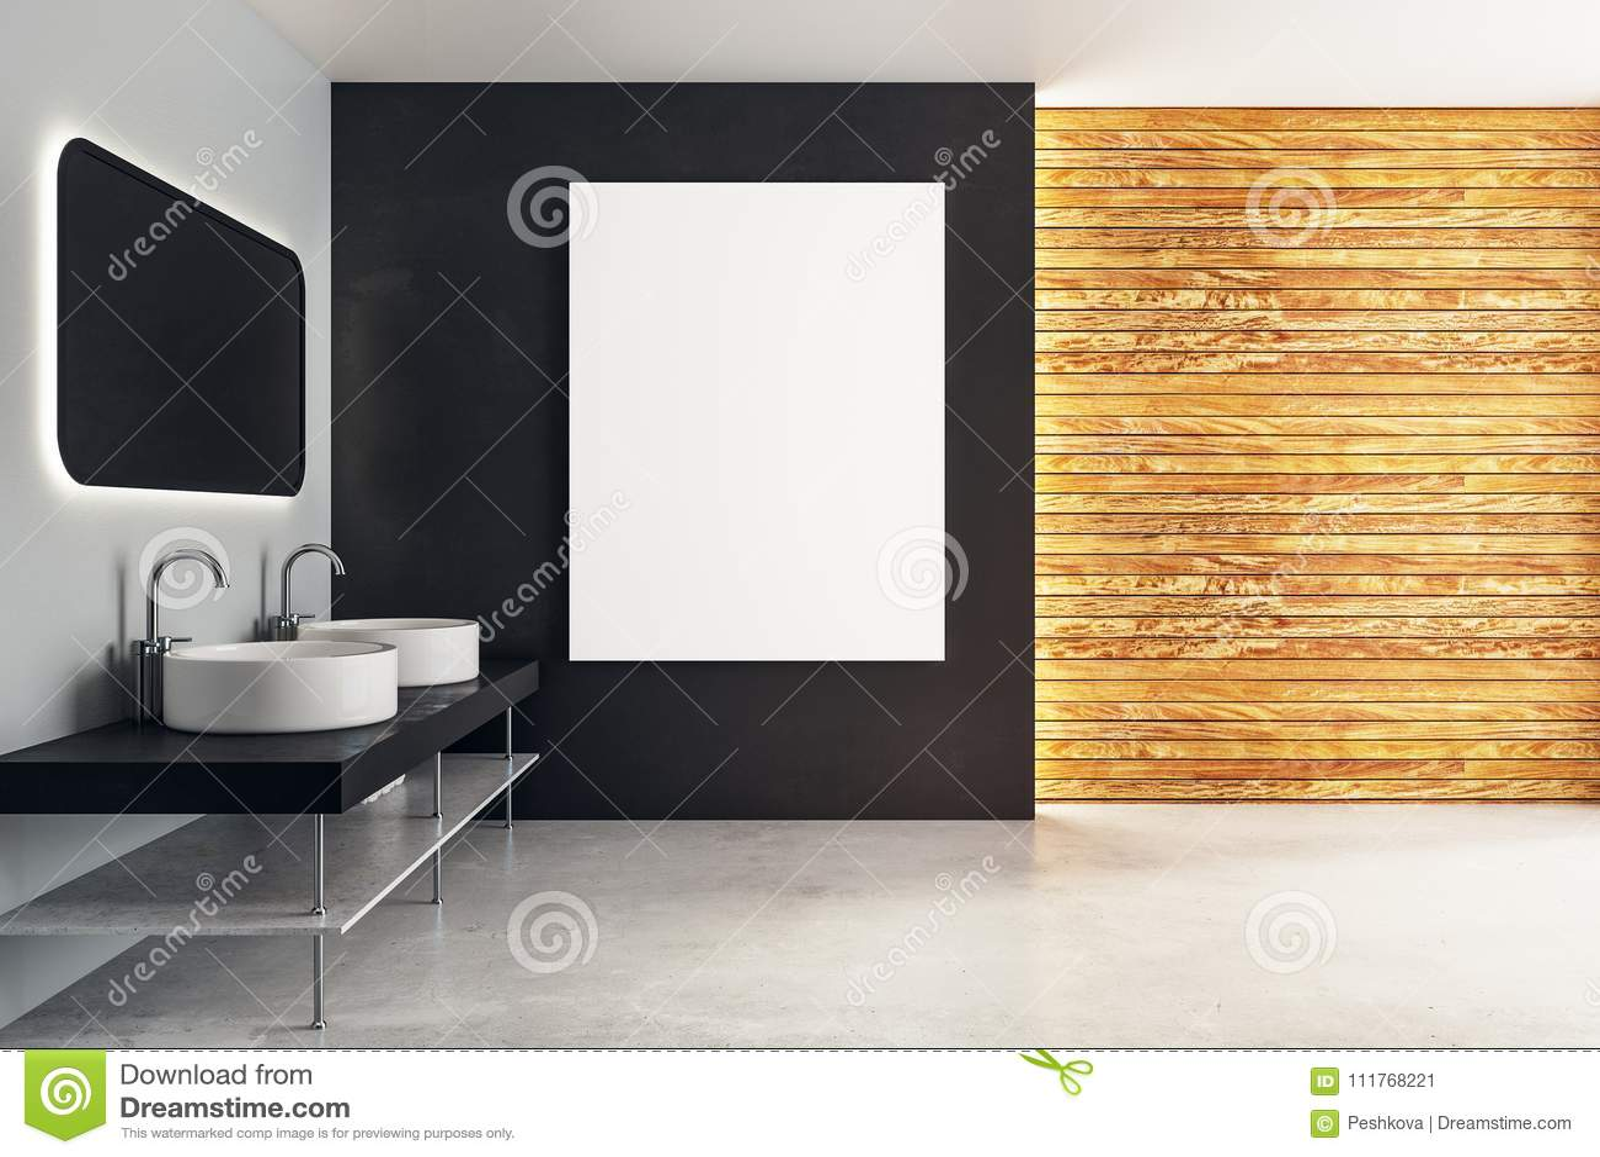 bathroom mirror reflection. Download Modern Bathroom With Banner Stock Illustration - Of Bathroom, Interior: 111768221 Mirror Reflection